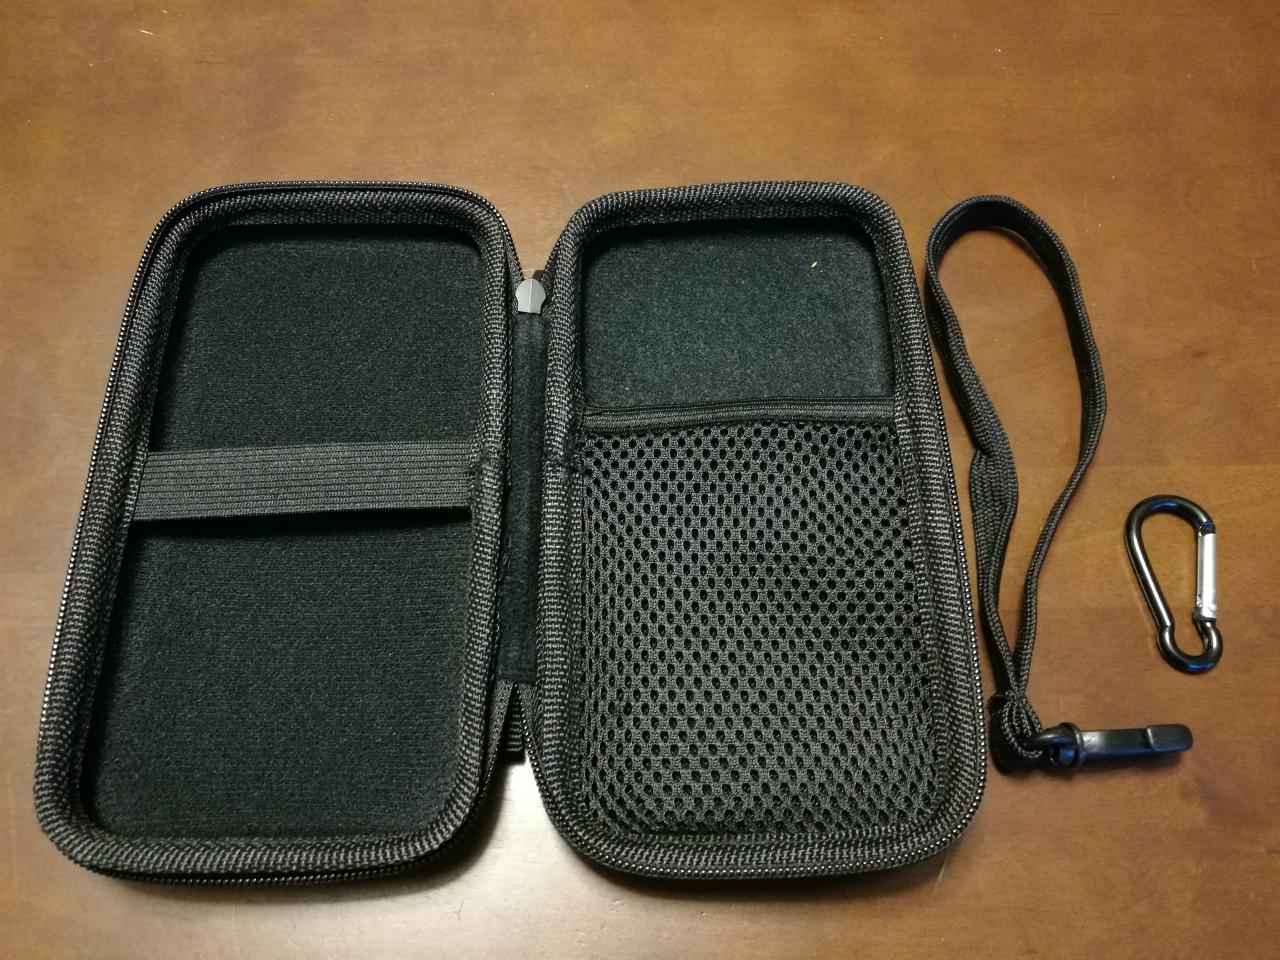 pr-ec-technology-mobile-battery-case-03